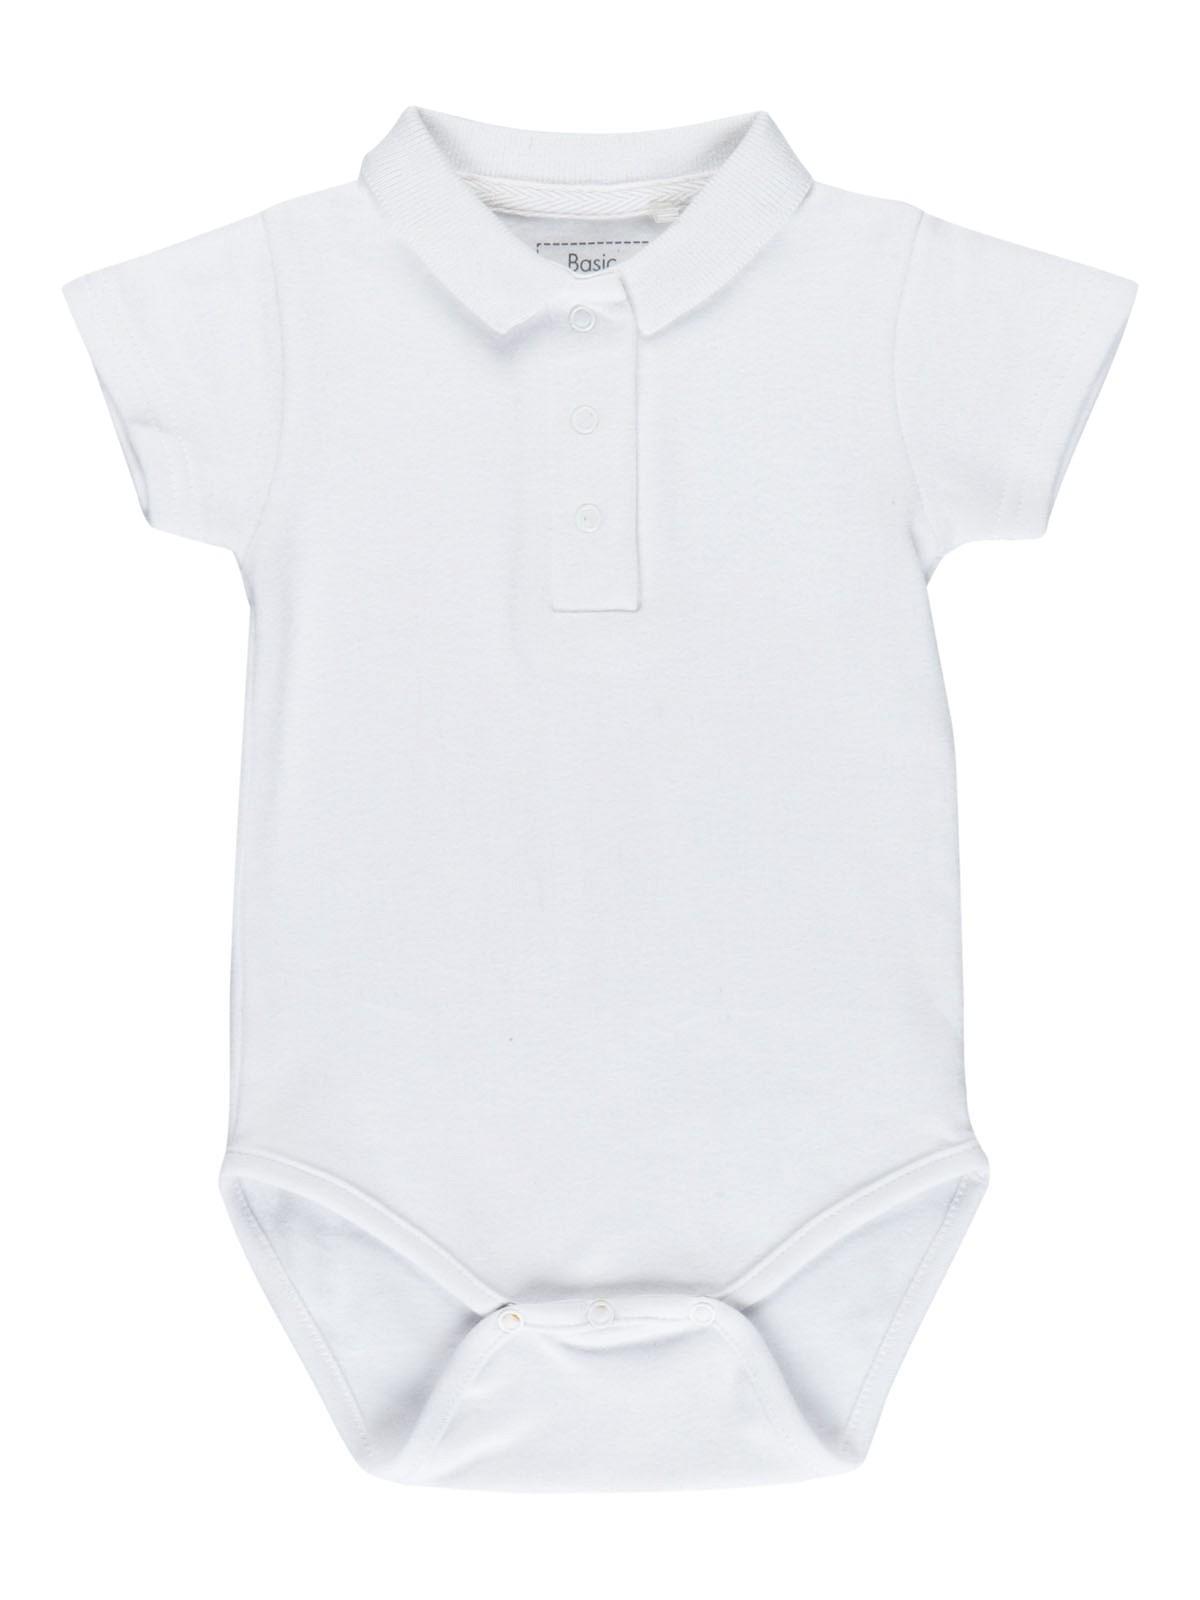 Body polo bébé blanc garçon (3-24M) - DistriCenter 204c32f229a